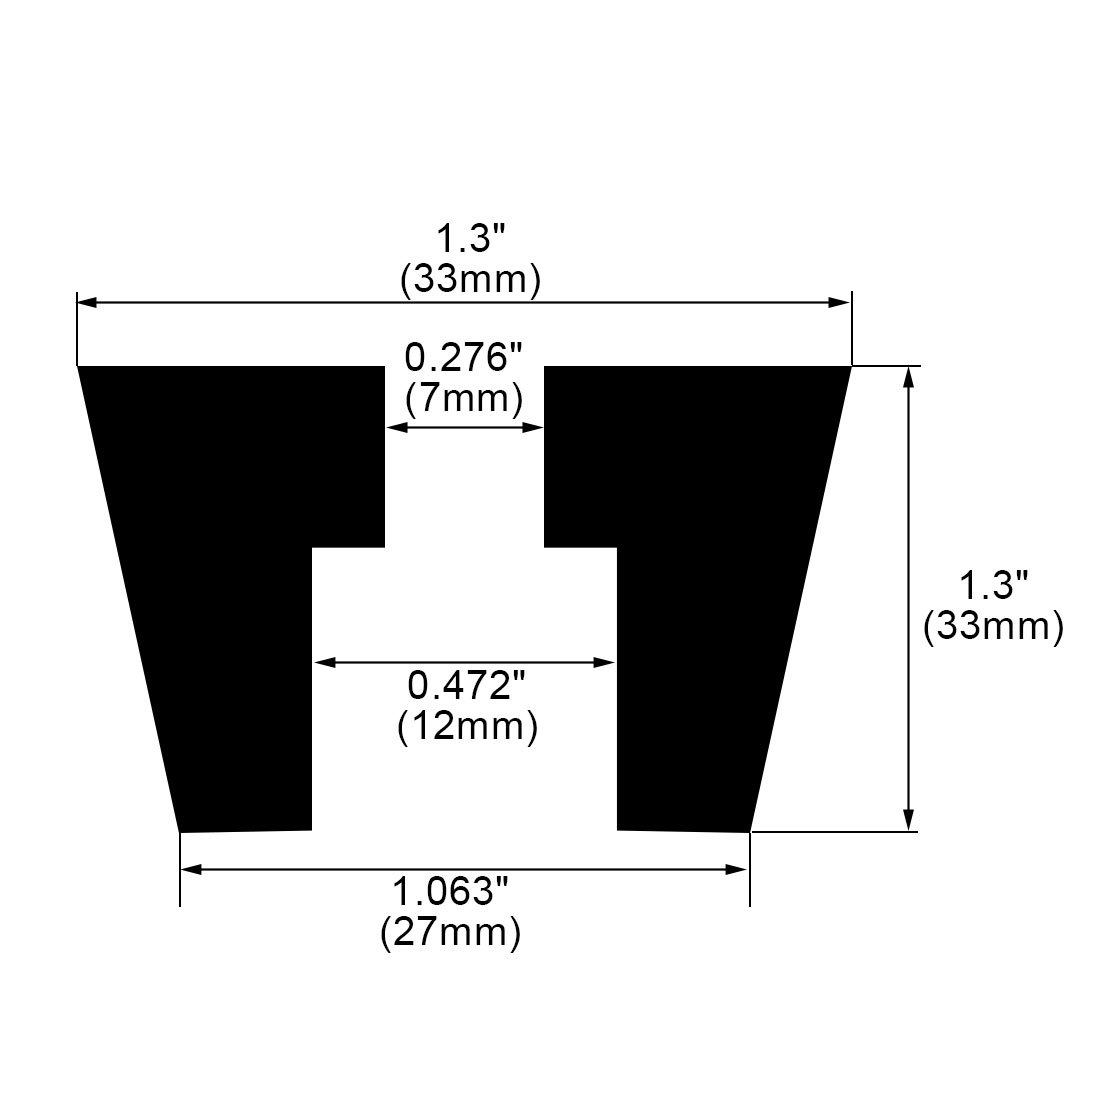 34pcs Rubber Feet Bumper Furniture Table Leg Pads Floor Protector, D33x27xH33mm - image 1 of 7